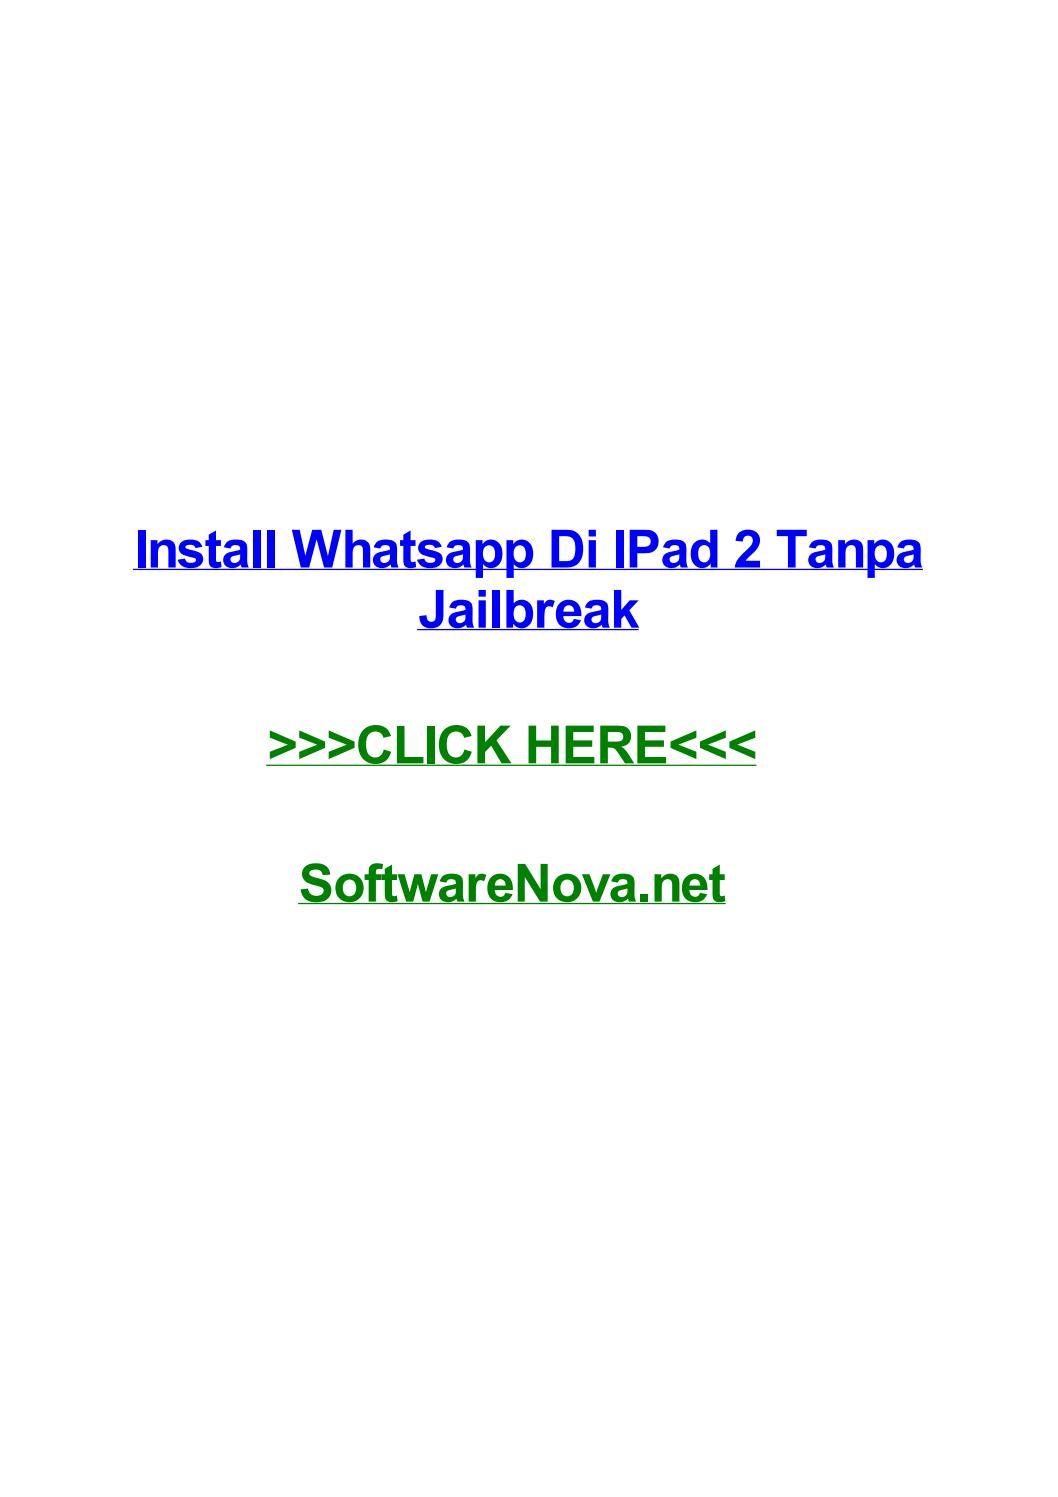 Install whatsapp di ipad 2 tanpa jailbreak by juhiqyhe - issuu